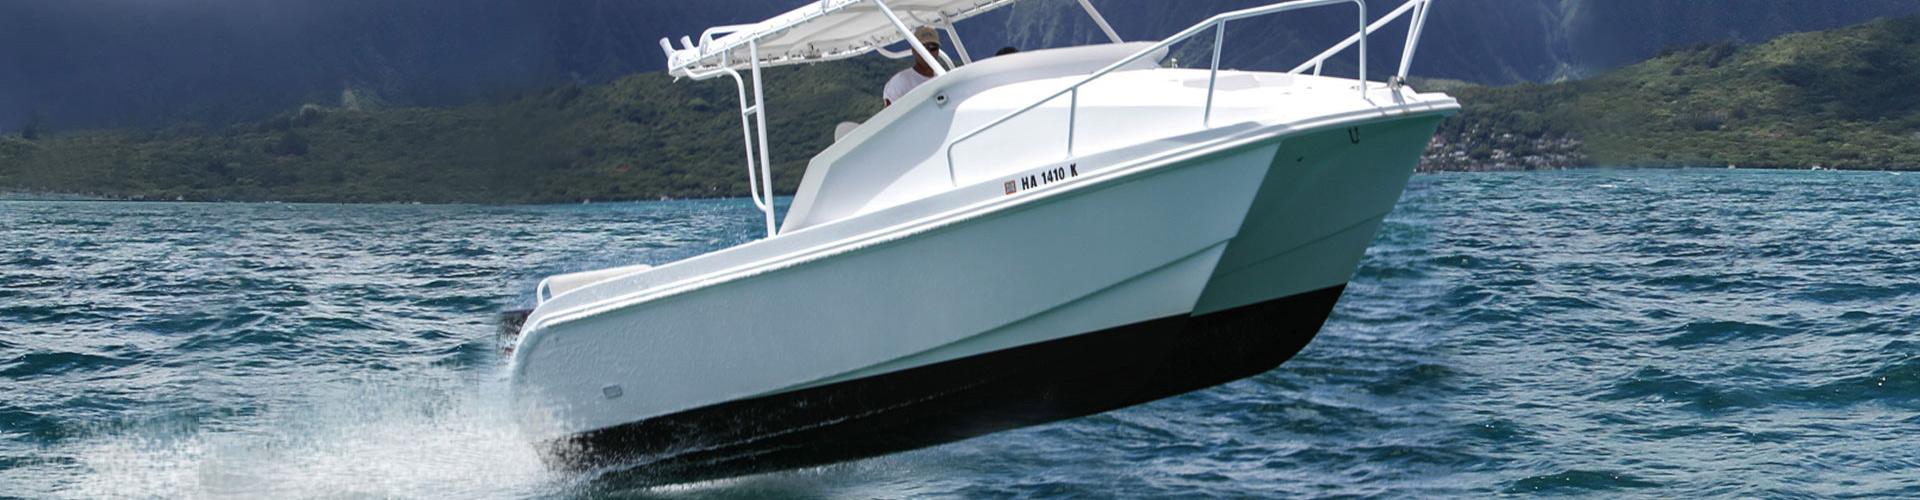 Home Windward Boats Kailua, HI 808-263-6030